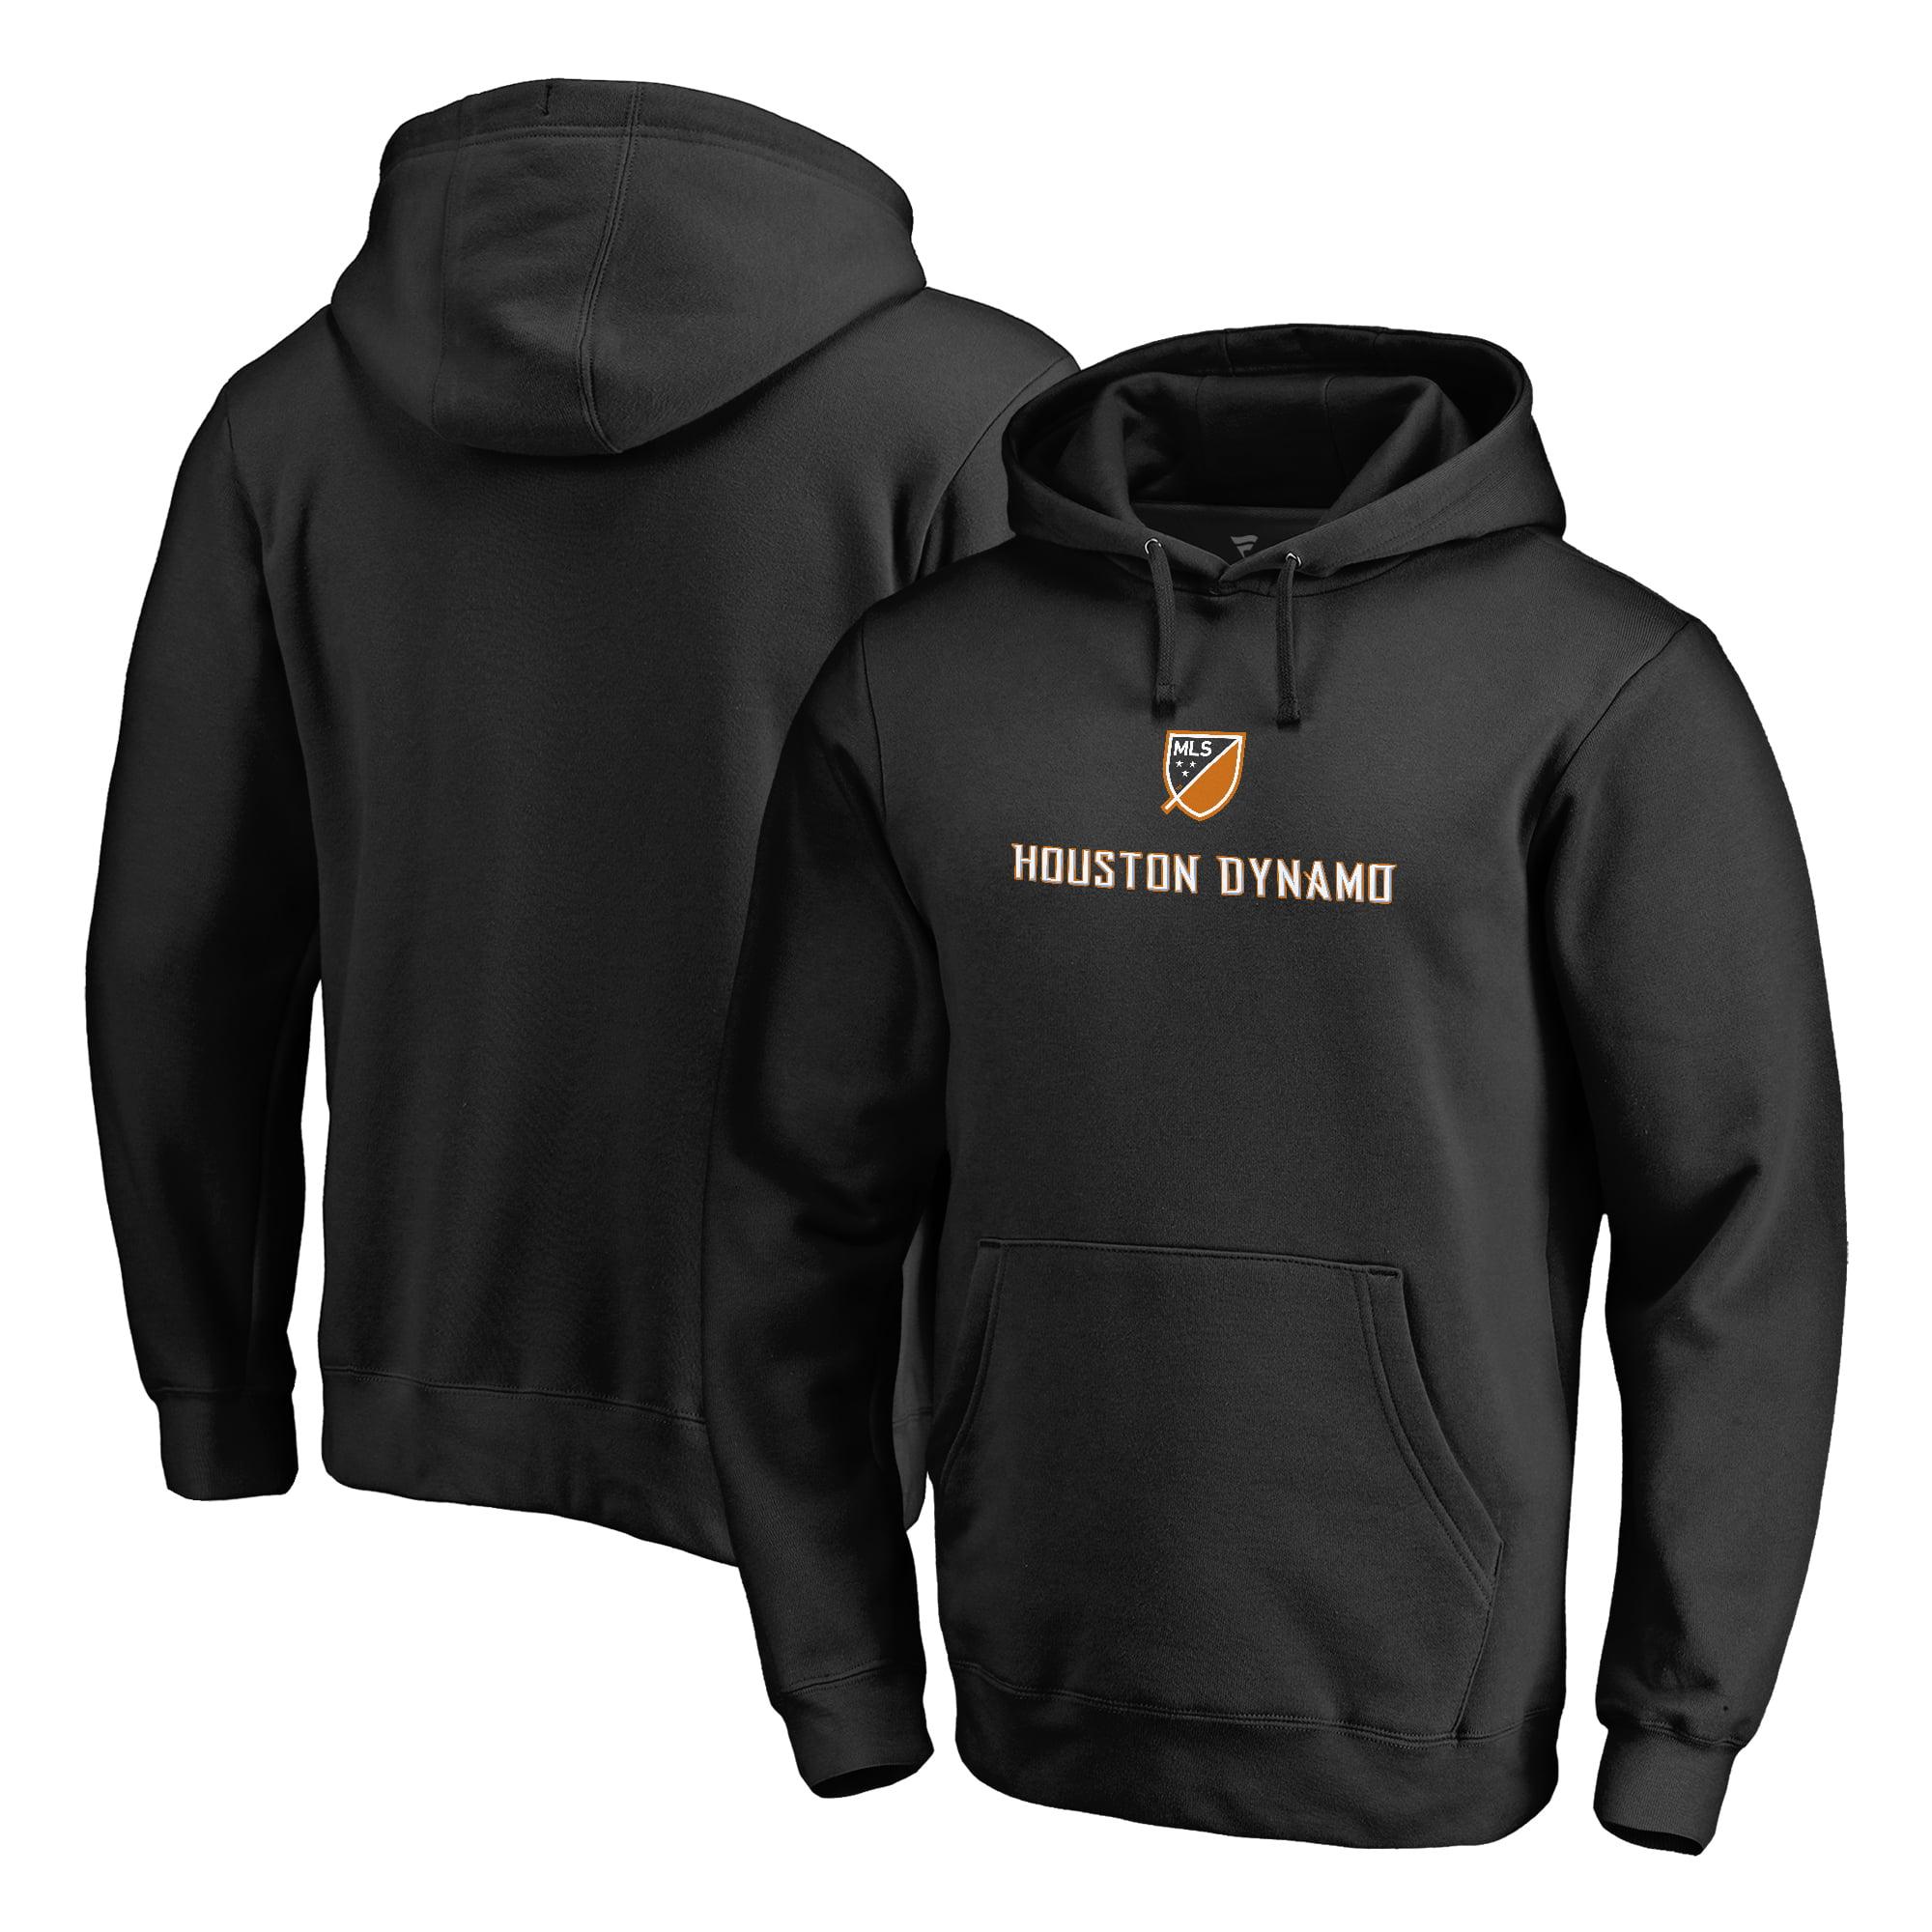 Houston Dynamo Fanatics Branded Shielded Pullover Hoodie - Black